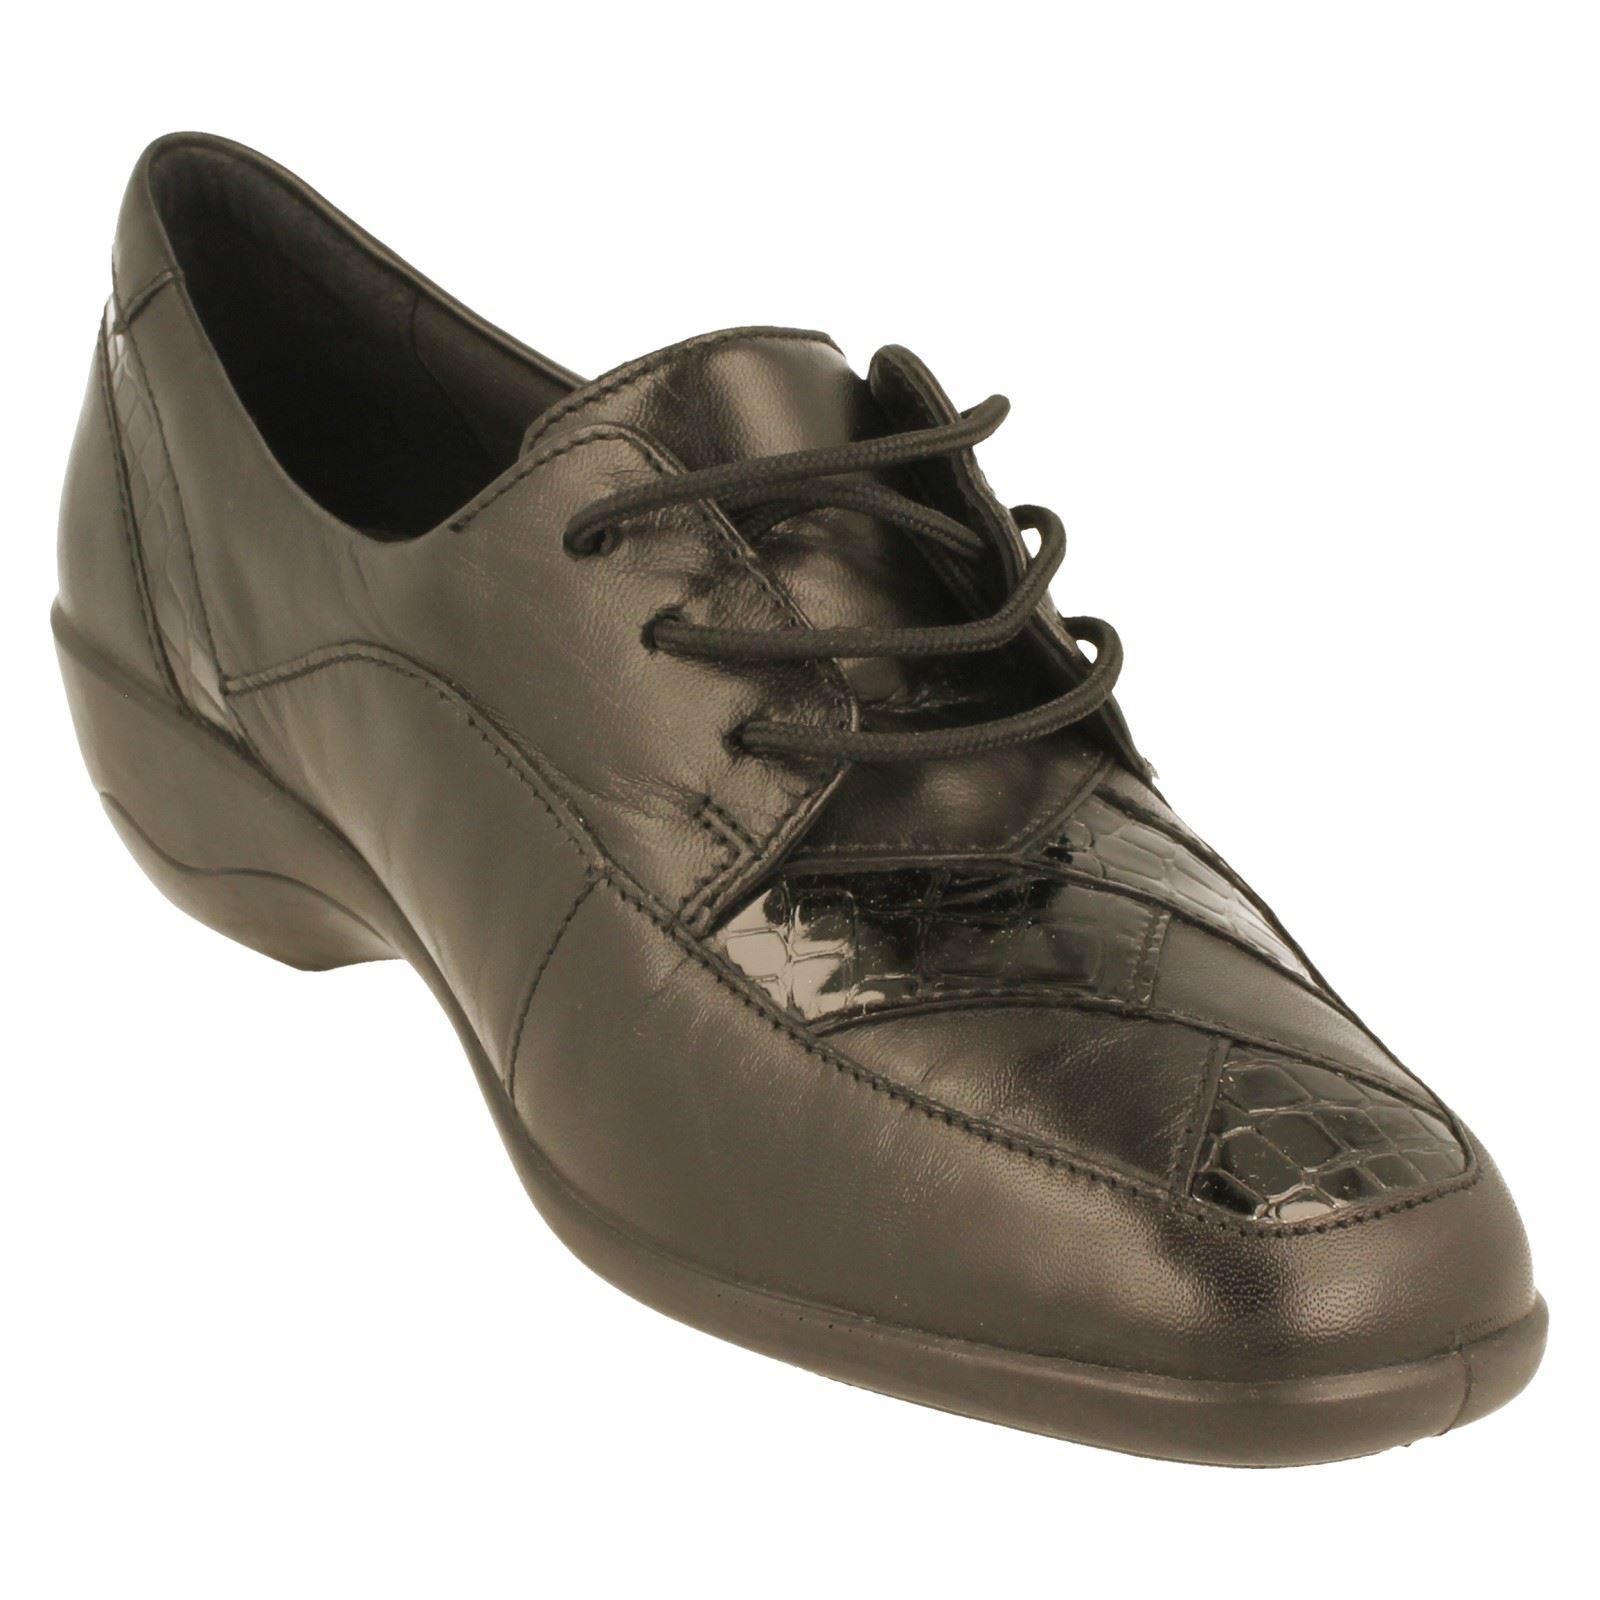 Extra Fitting Greta w Label Black Combi Shoe Padders Wide Ladies g7xqw545